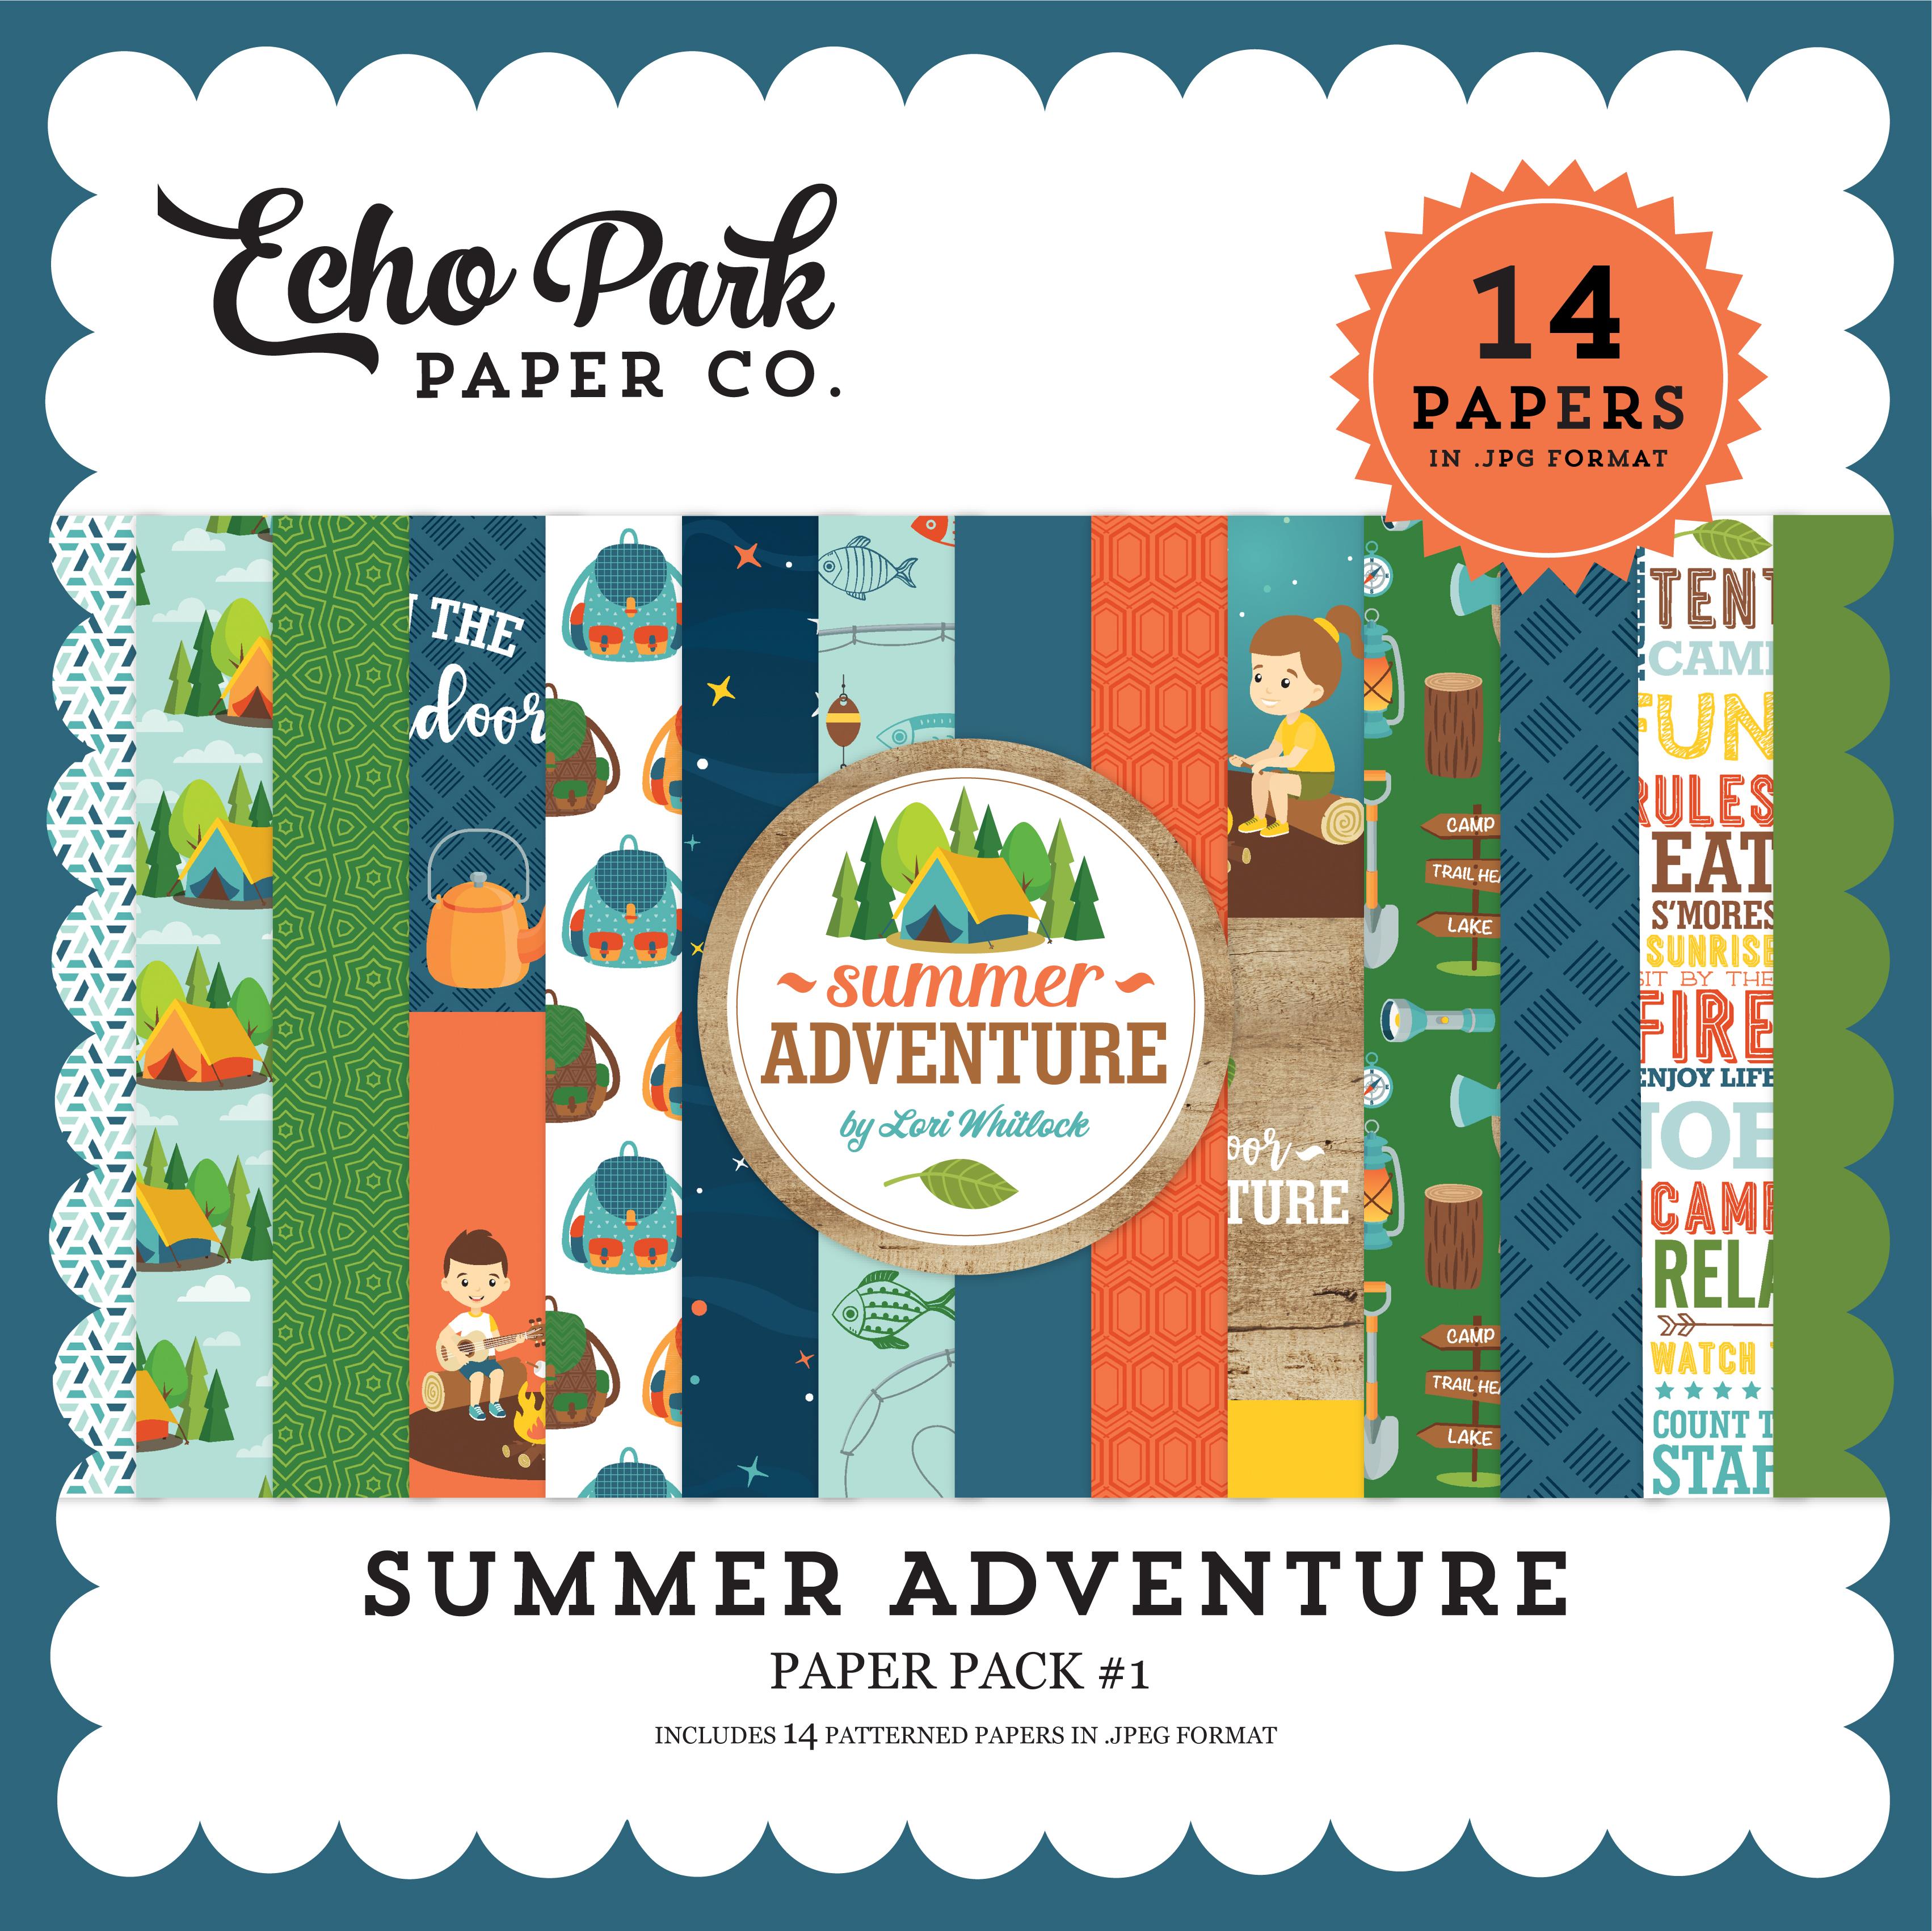 Summer Adventure Paper Pack #1